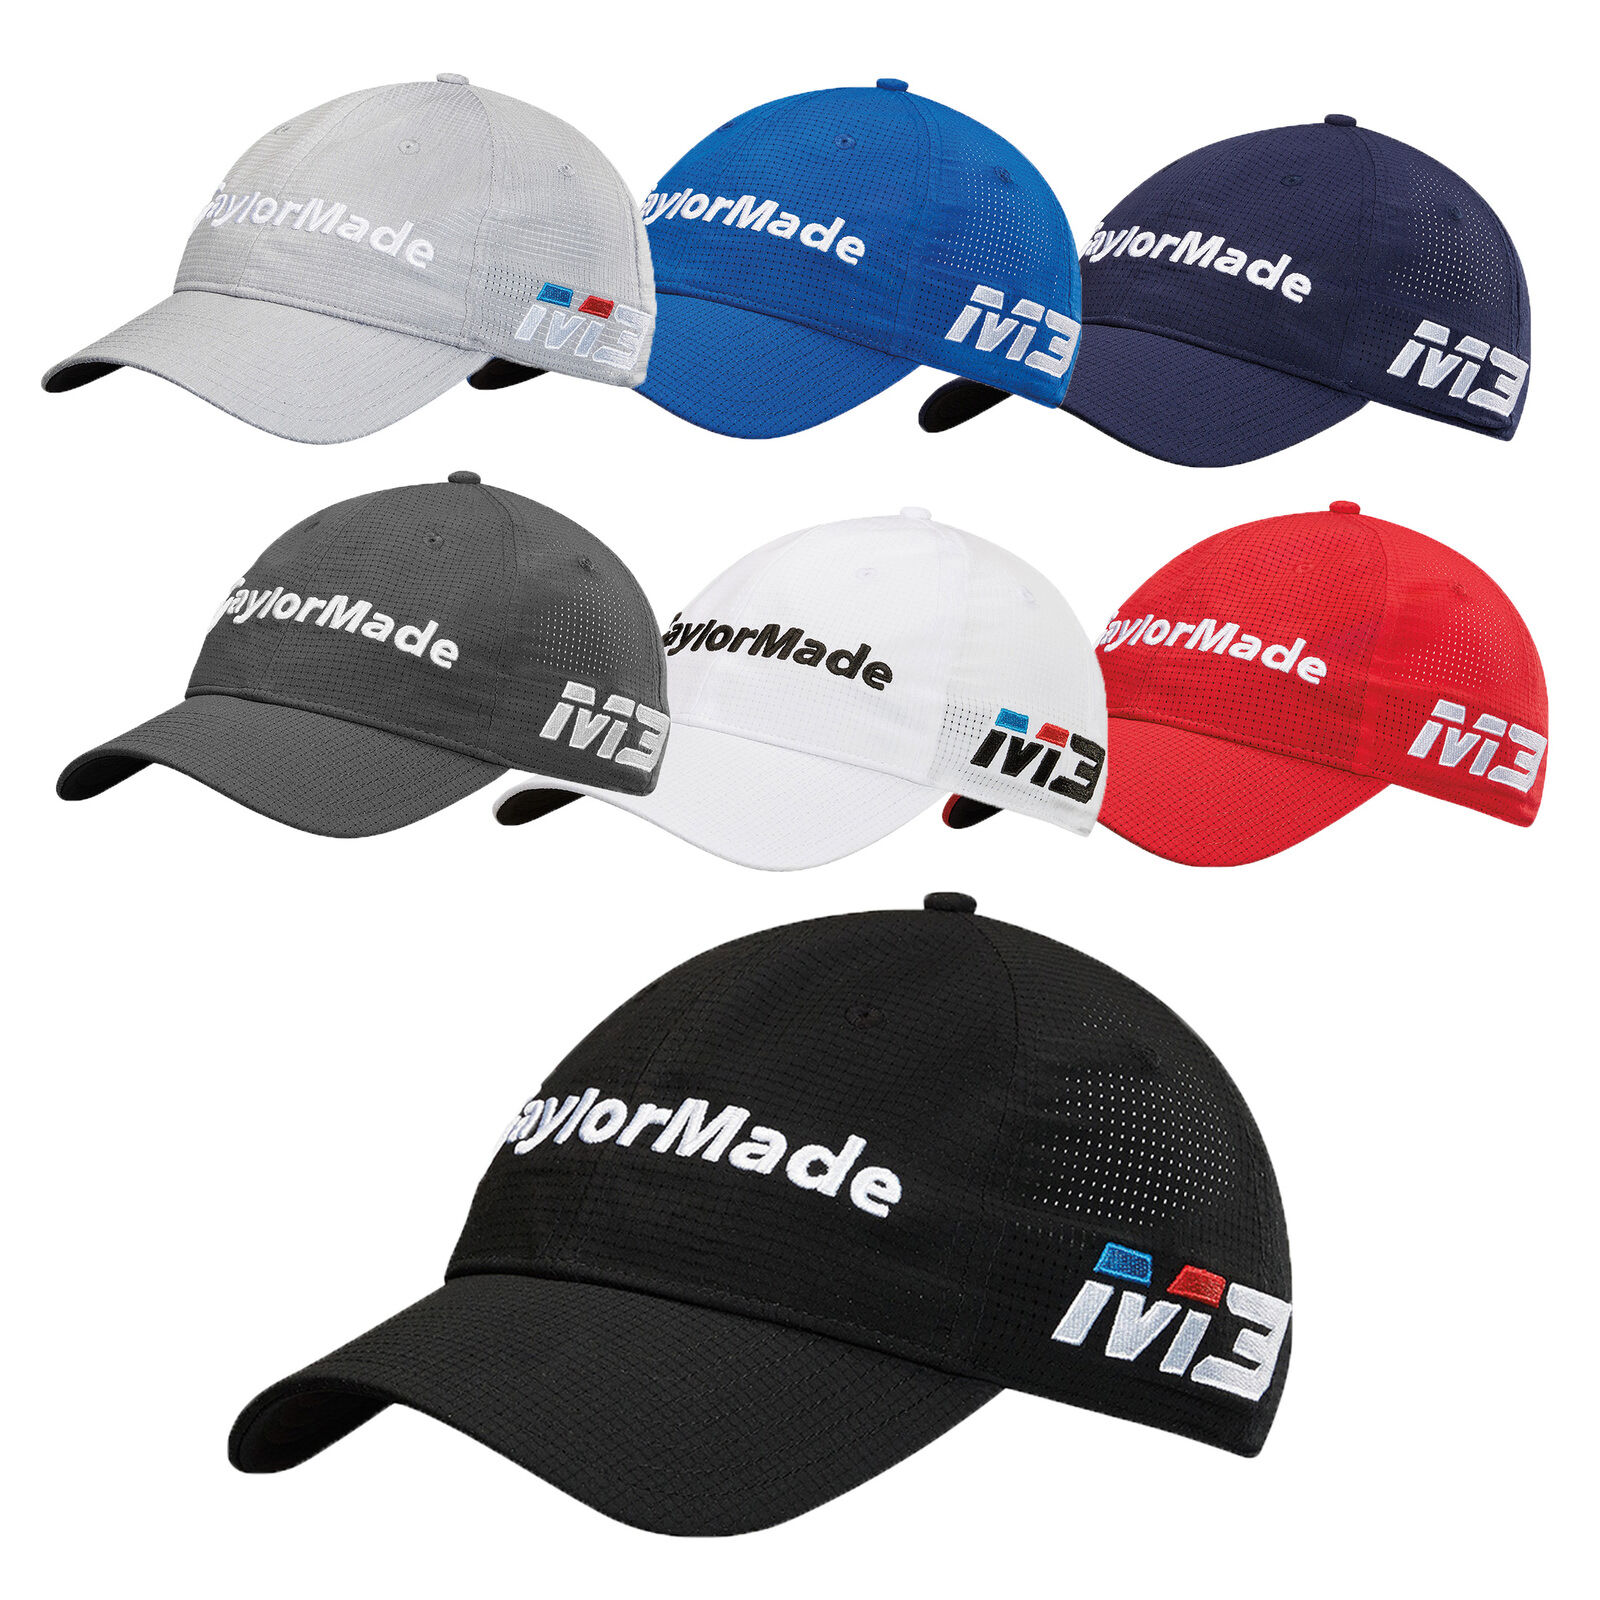 ca0dd466914 TaylorMade Golf- 2018 Litetech Tour Hat Cap Navy for sale online